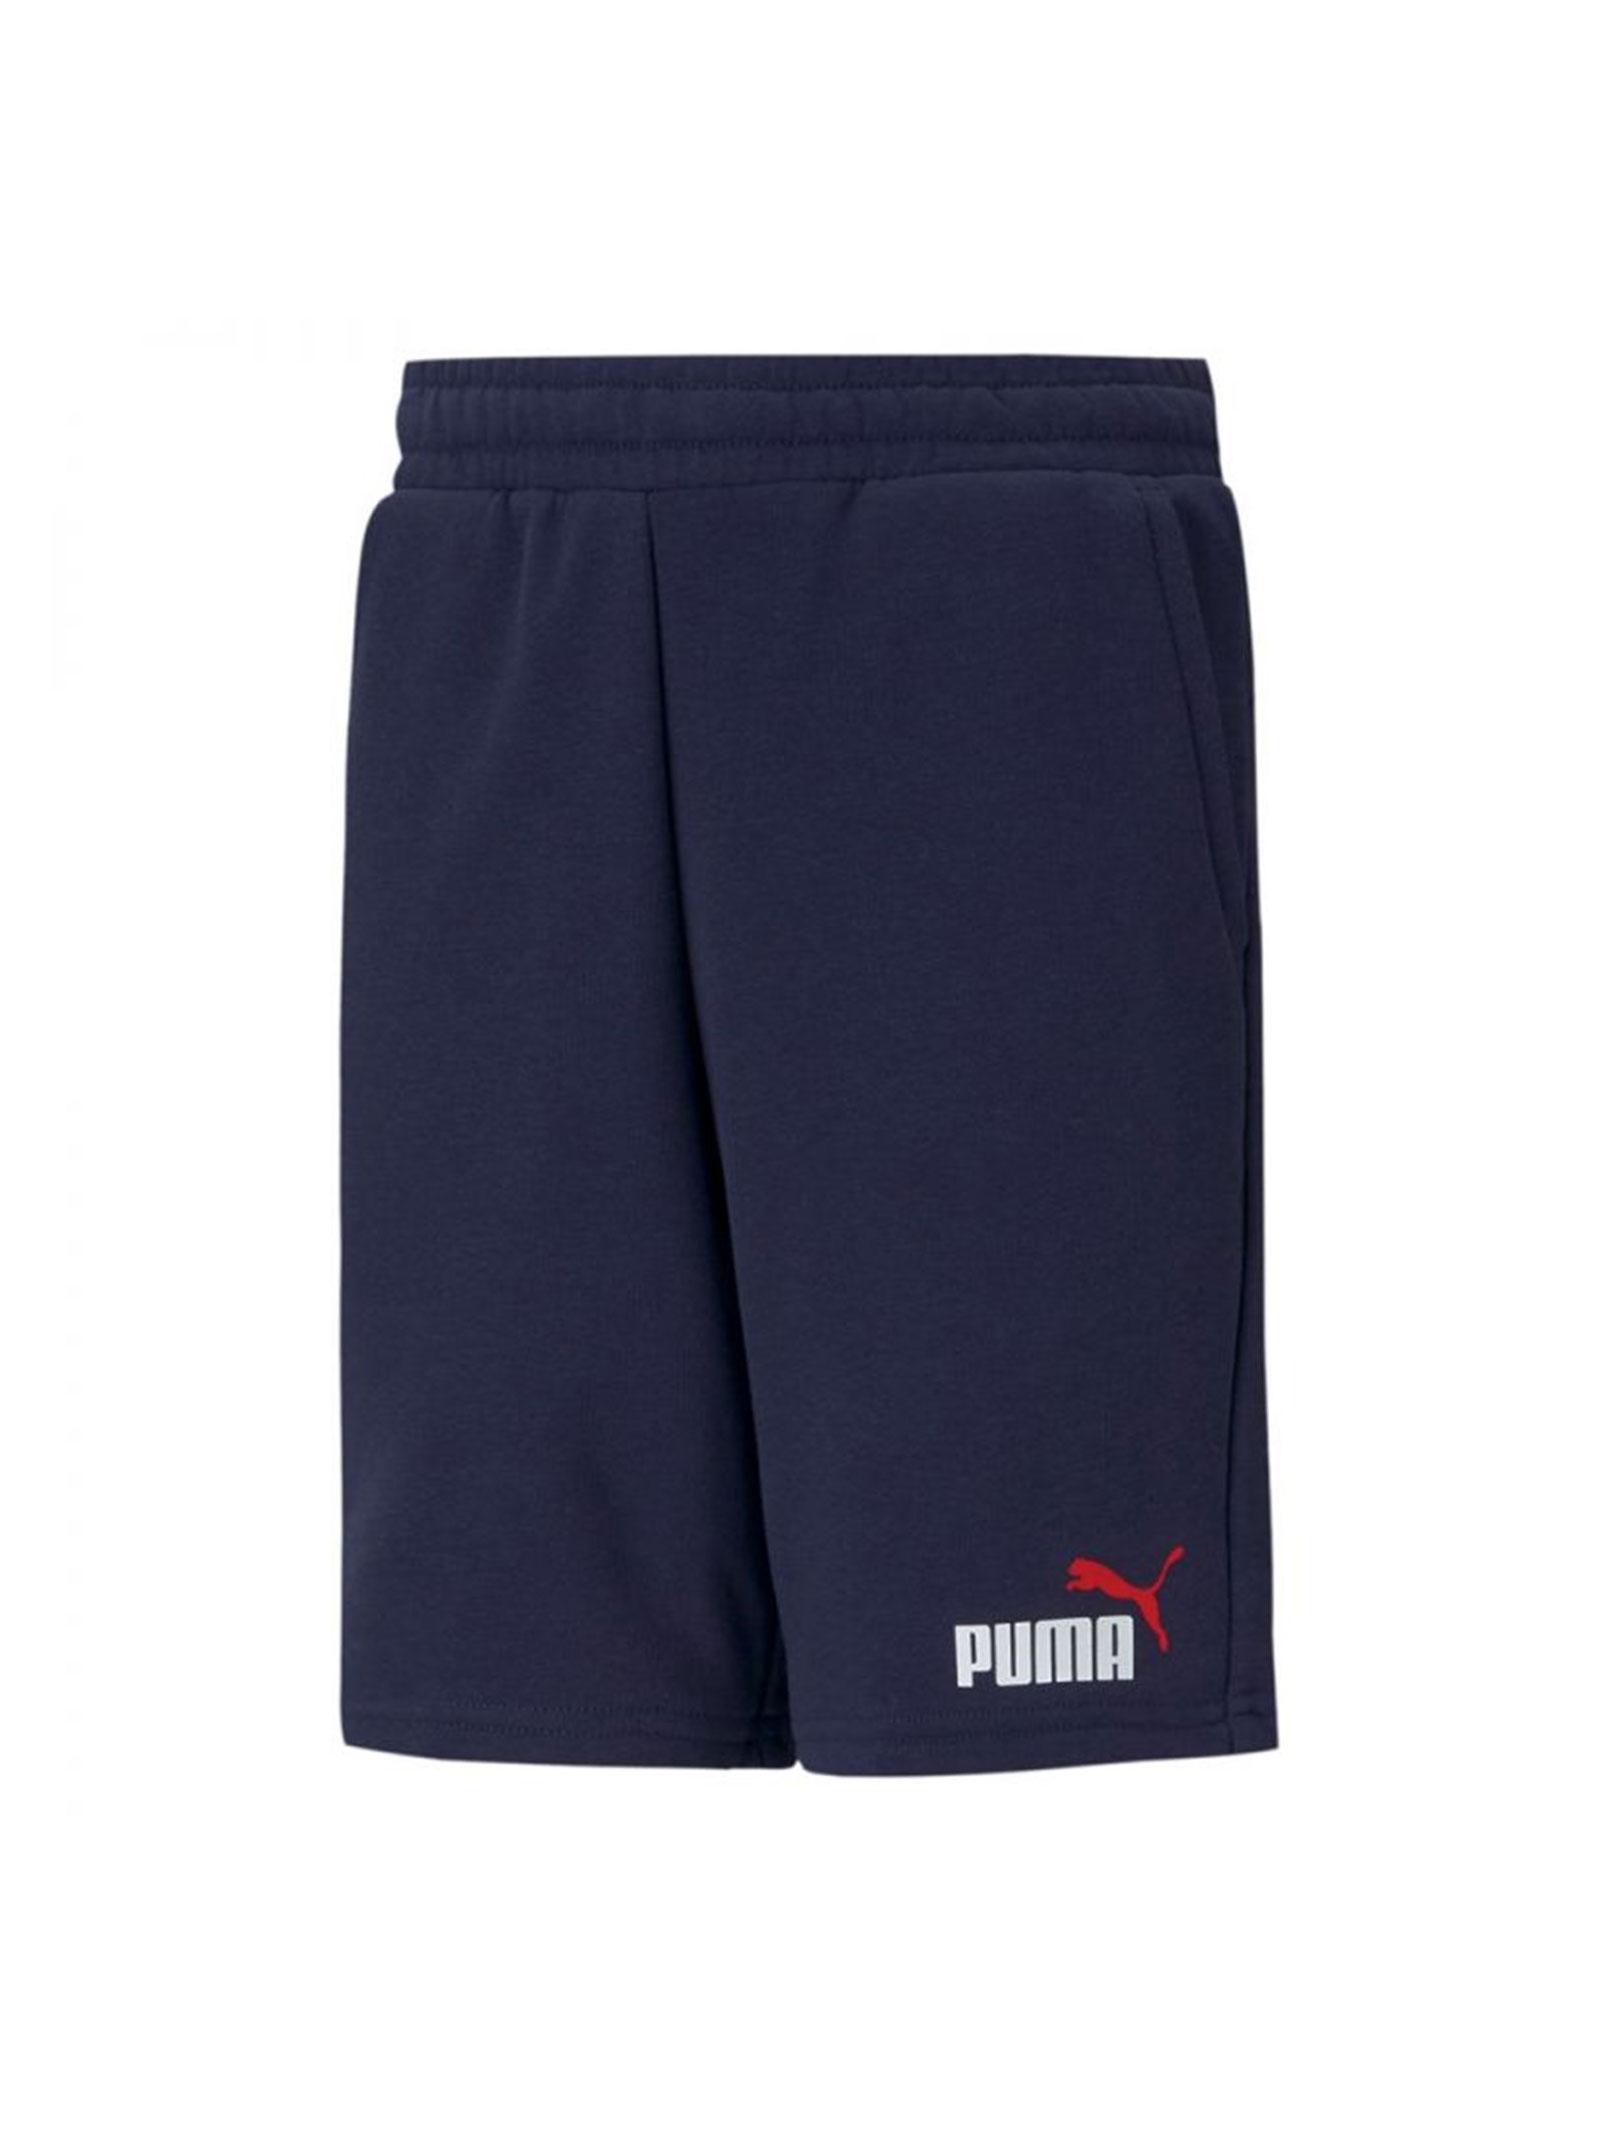 Pantaloncino da Bambino/Ragazzo Puma Essentials PUMA   2132079765   586989006